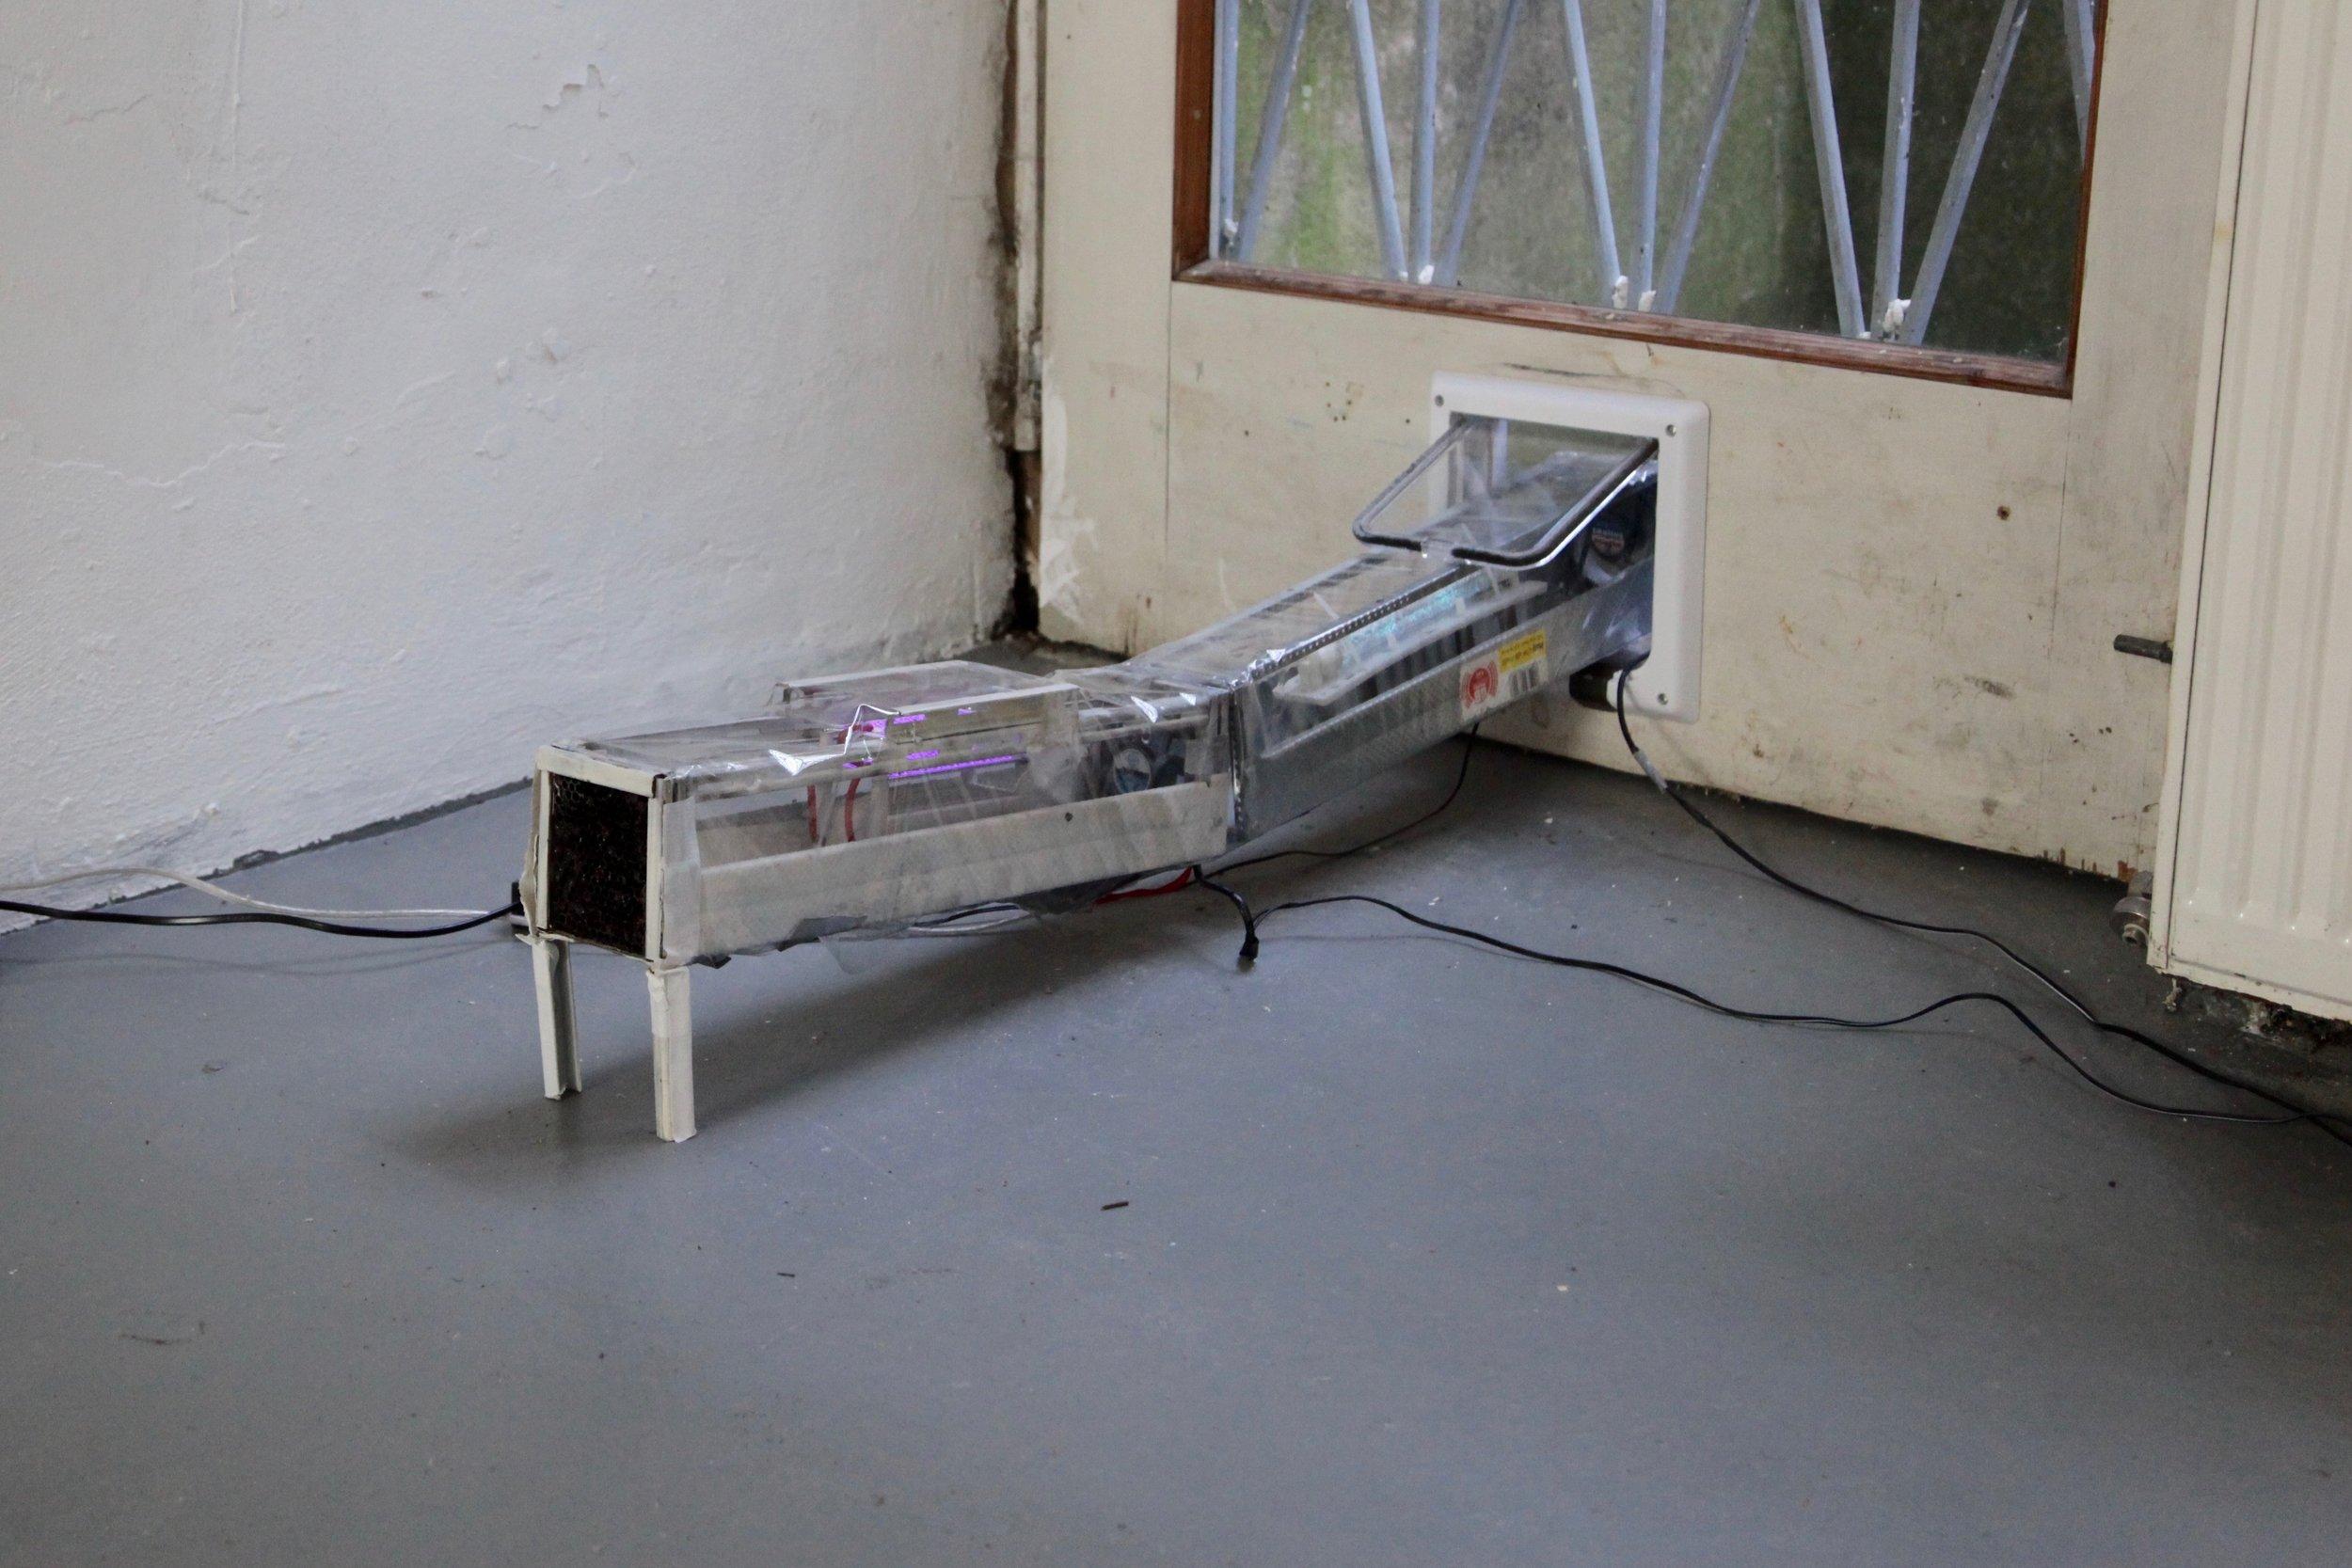 bobvanderwal12